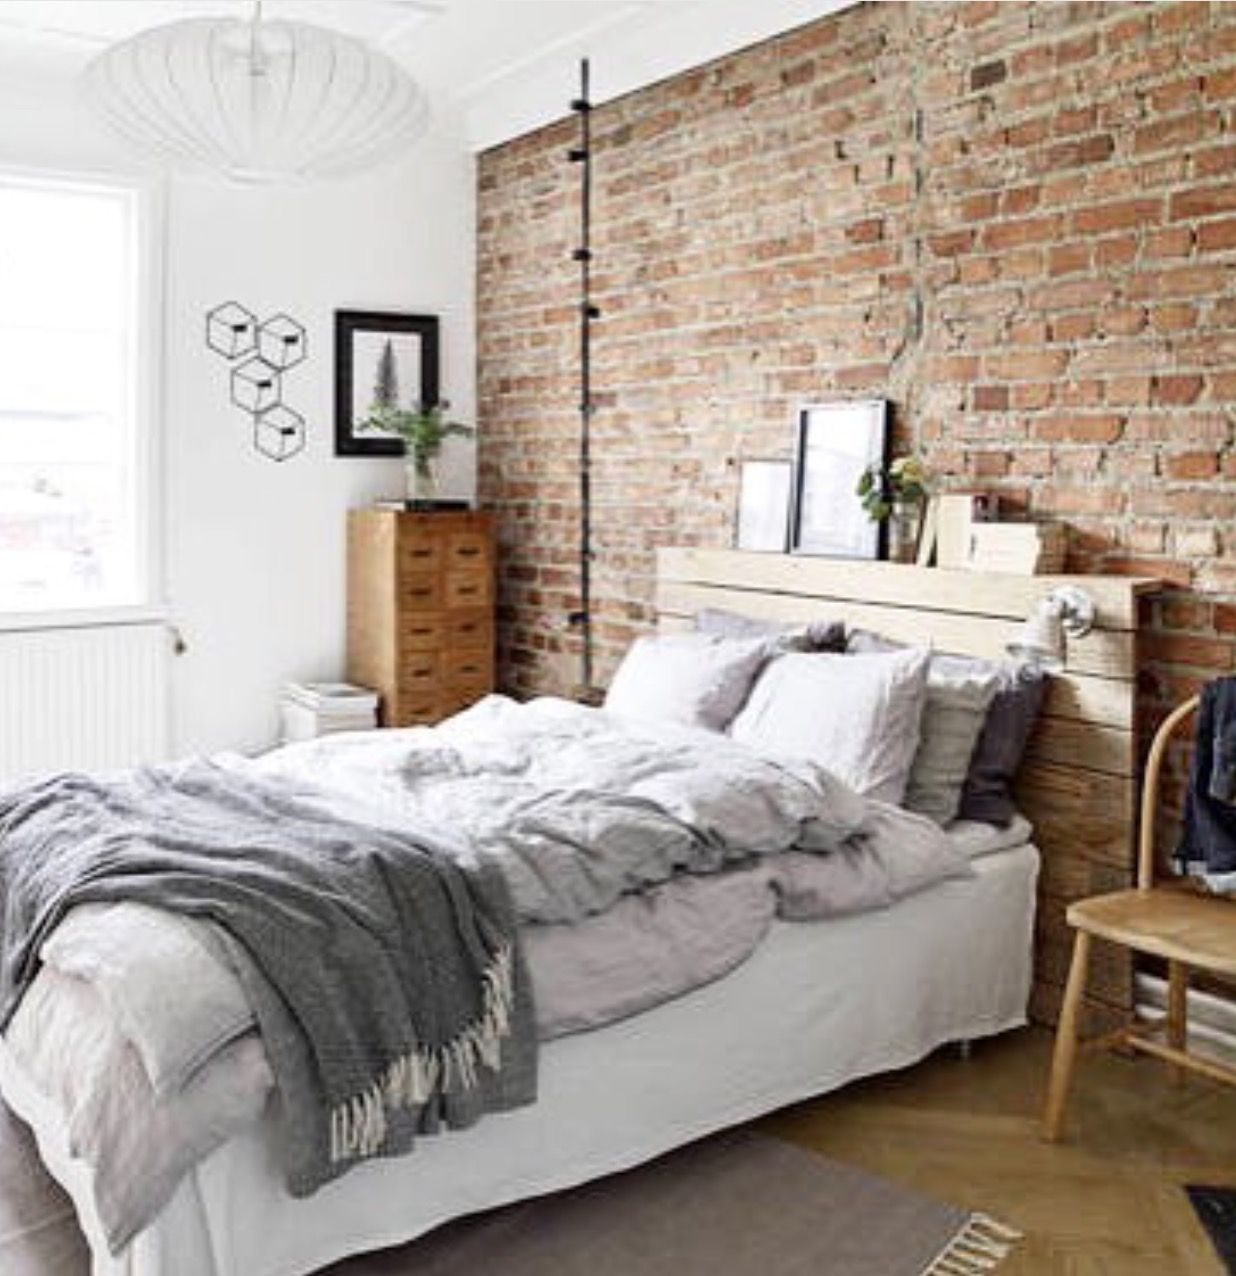 Brick wall design | bricks | Pinterest | Bricks, Walls and Bedrooms